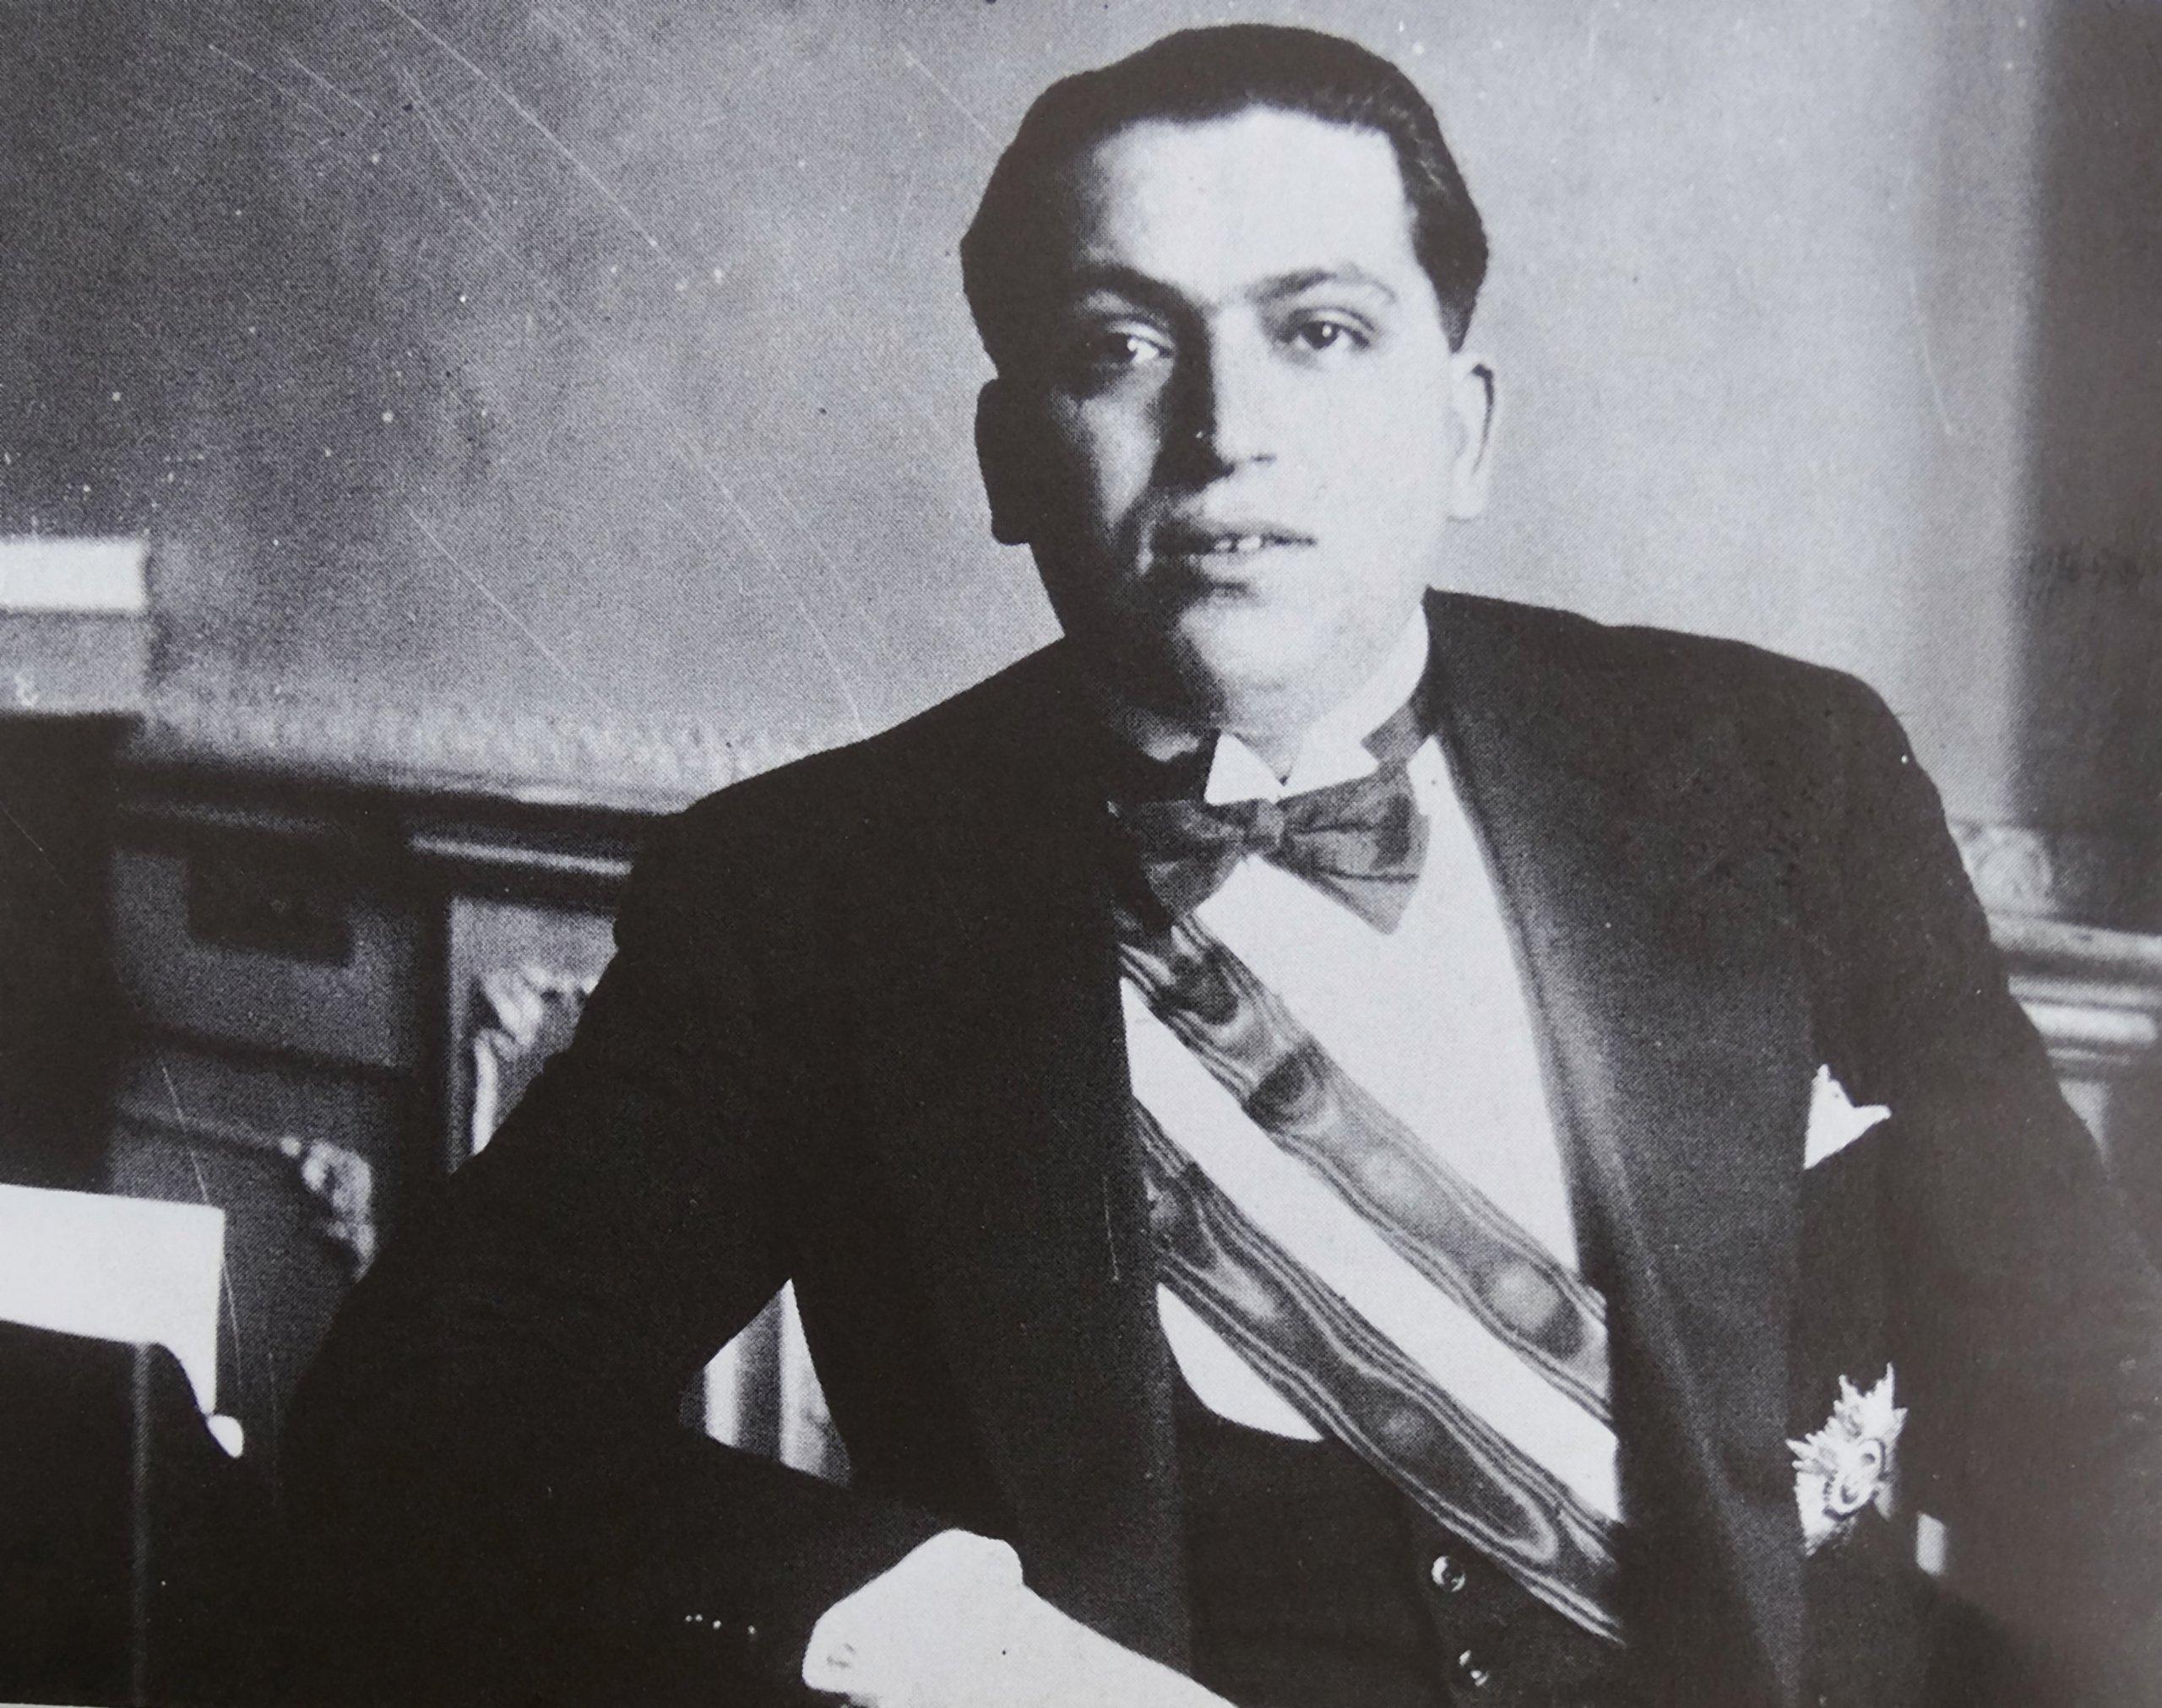 José Calvo Sotelo, 1st Duke of Calvo Sotelo.